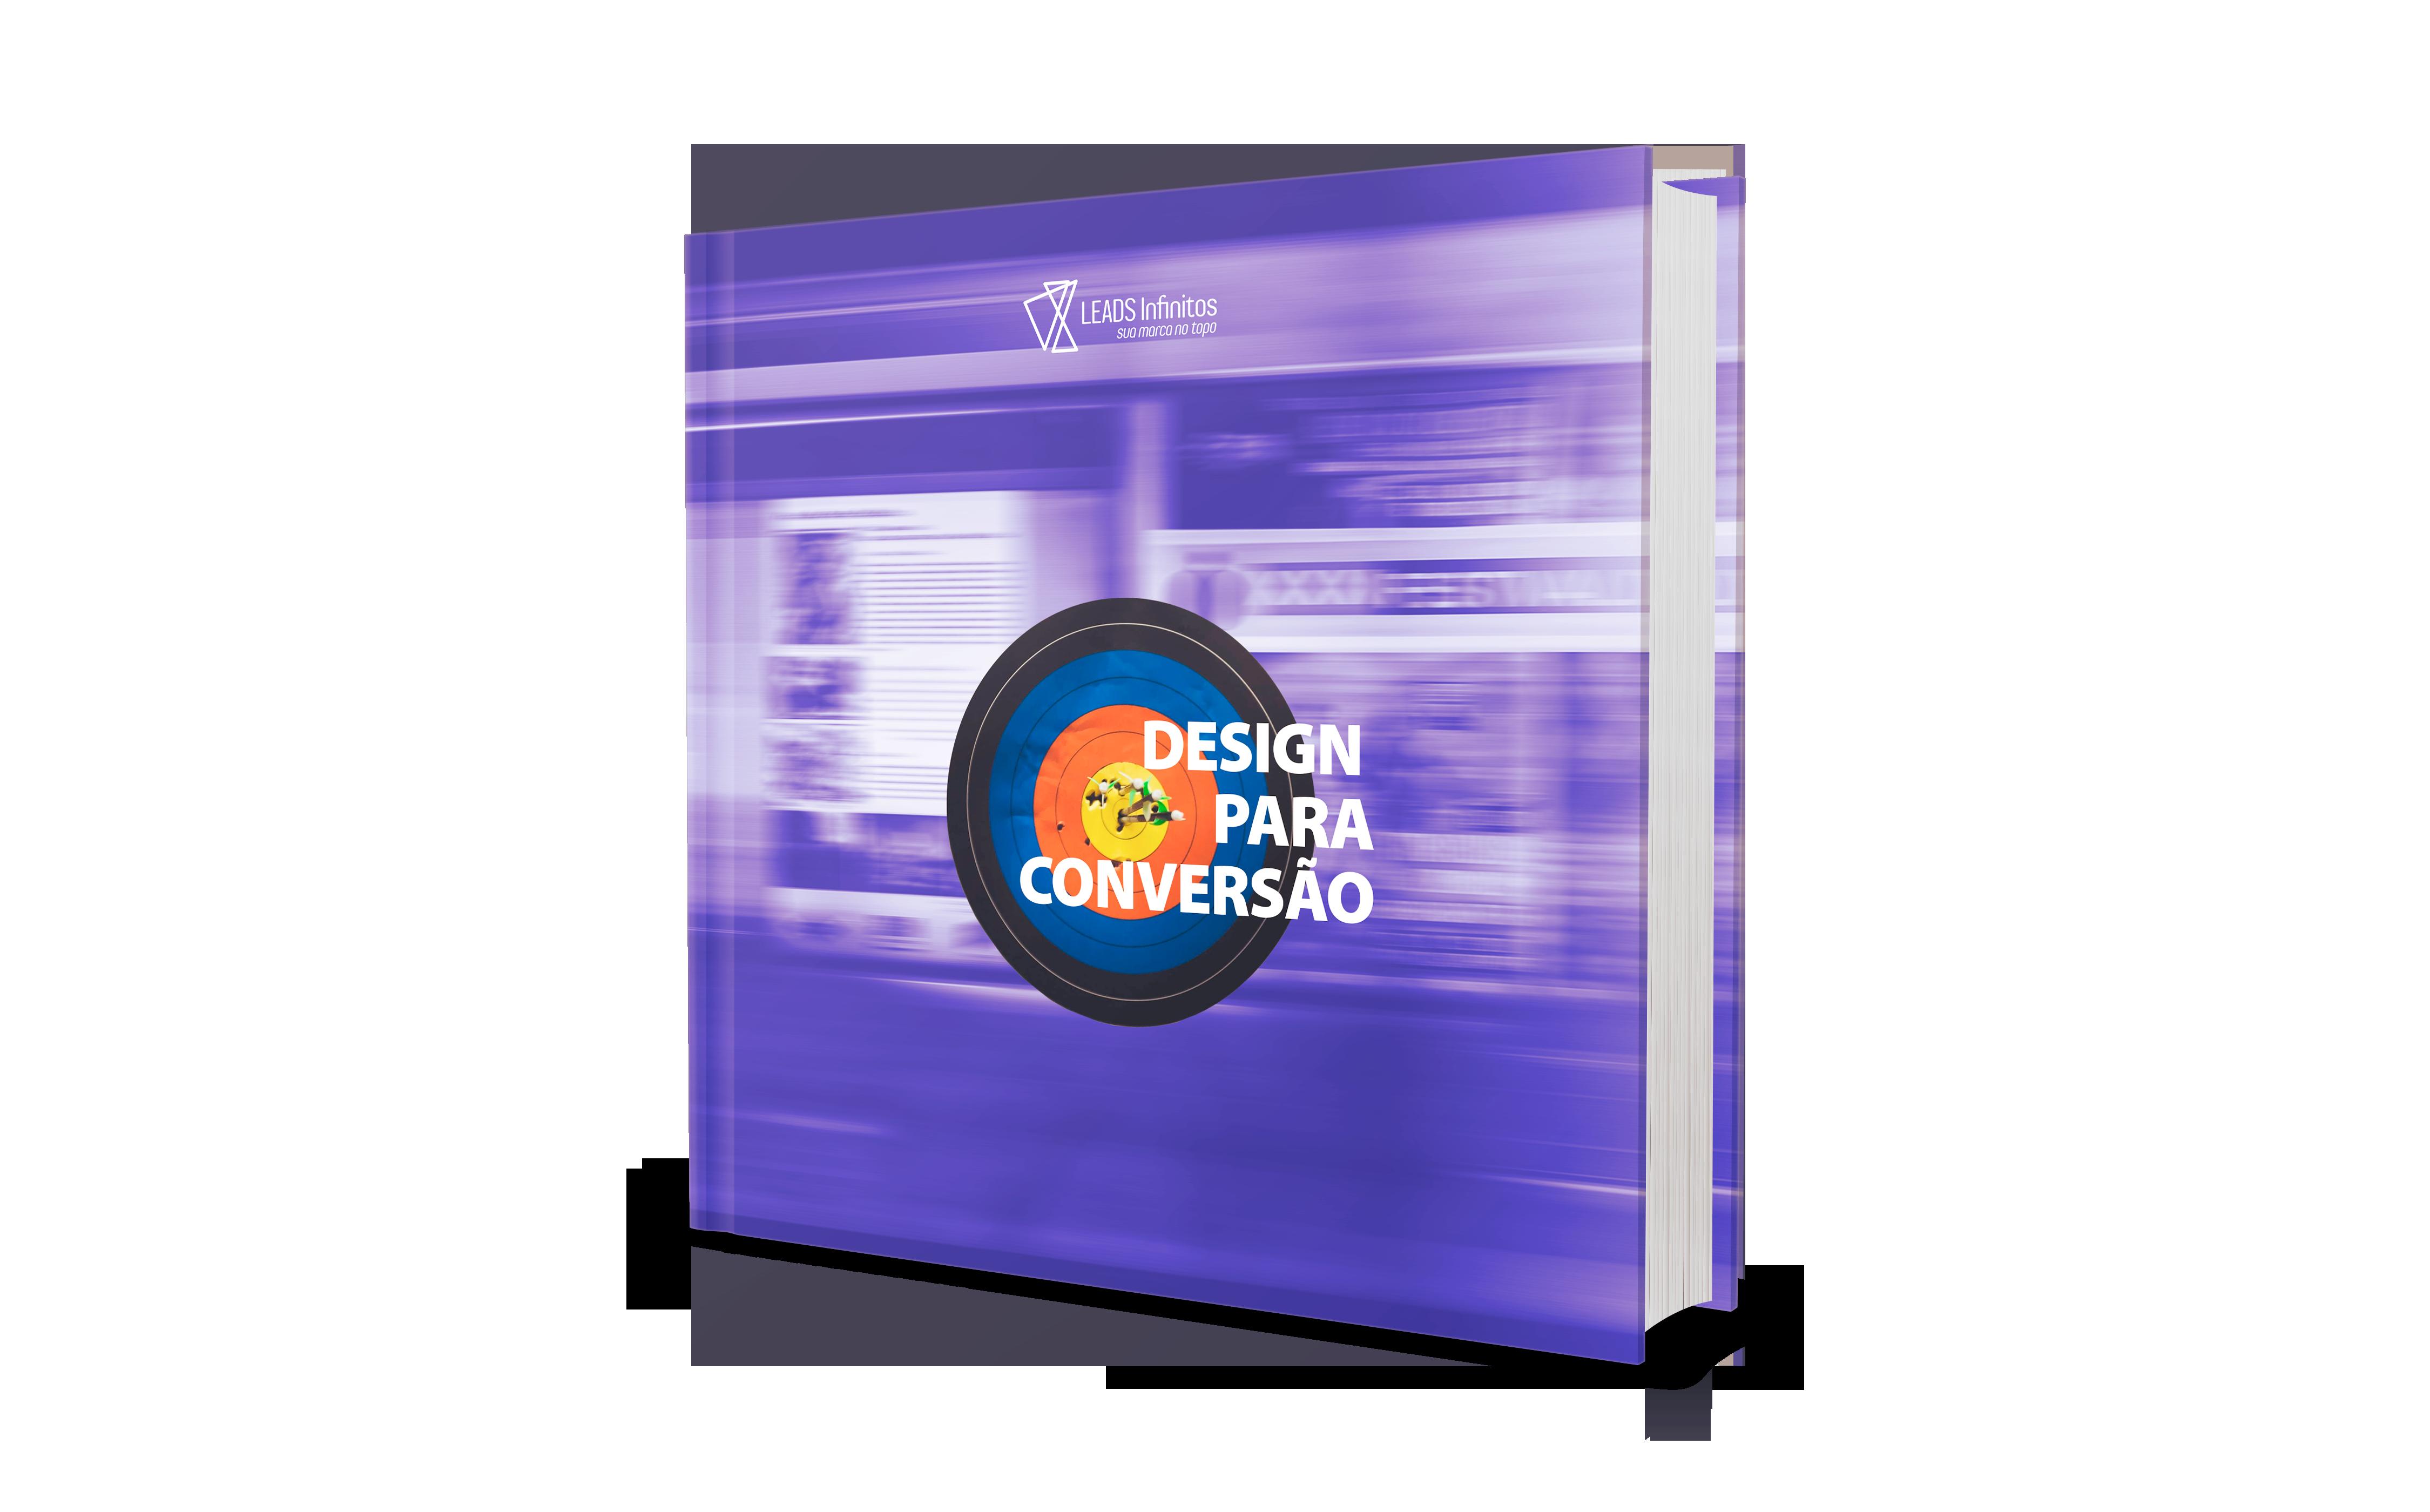 designparaconversao_mockup